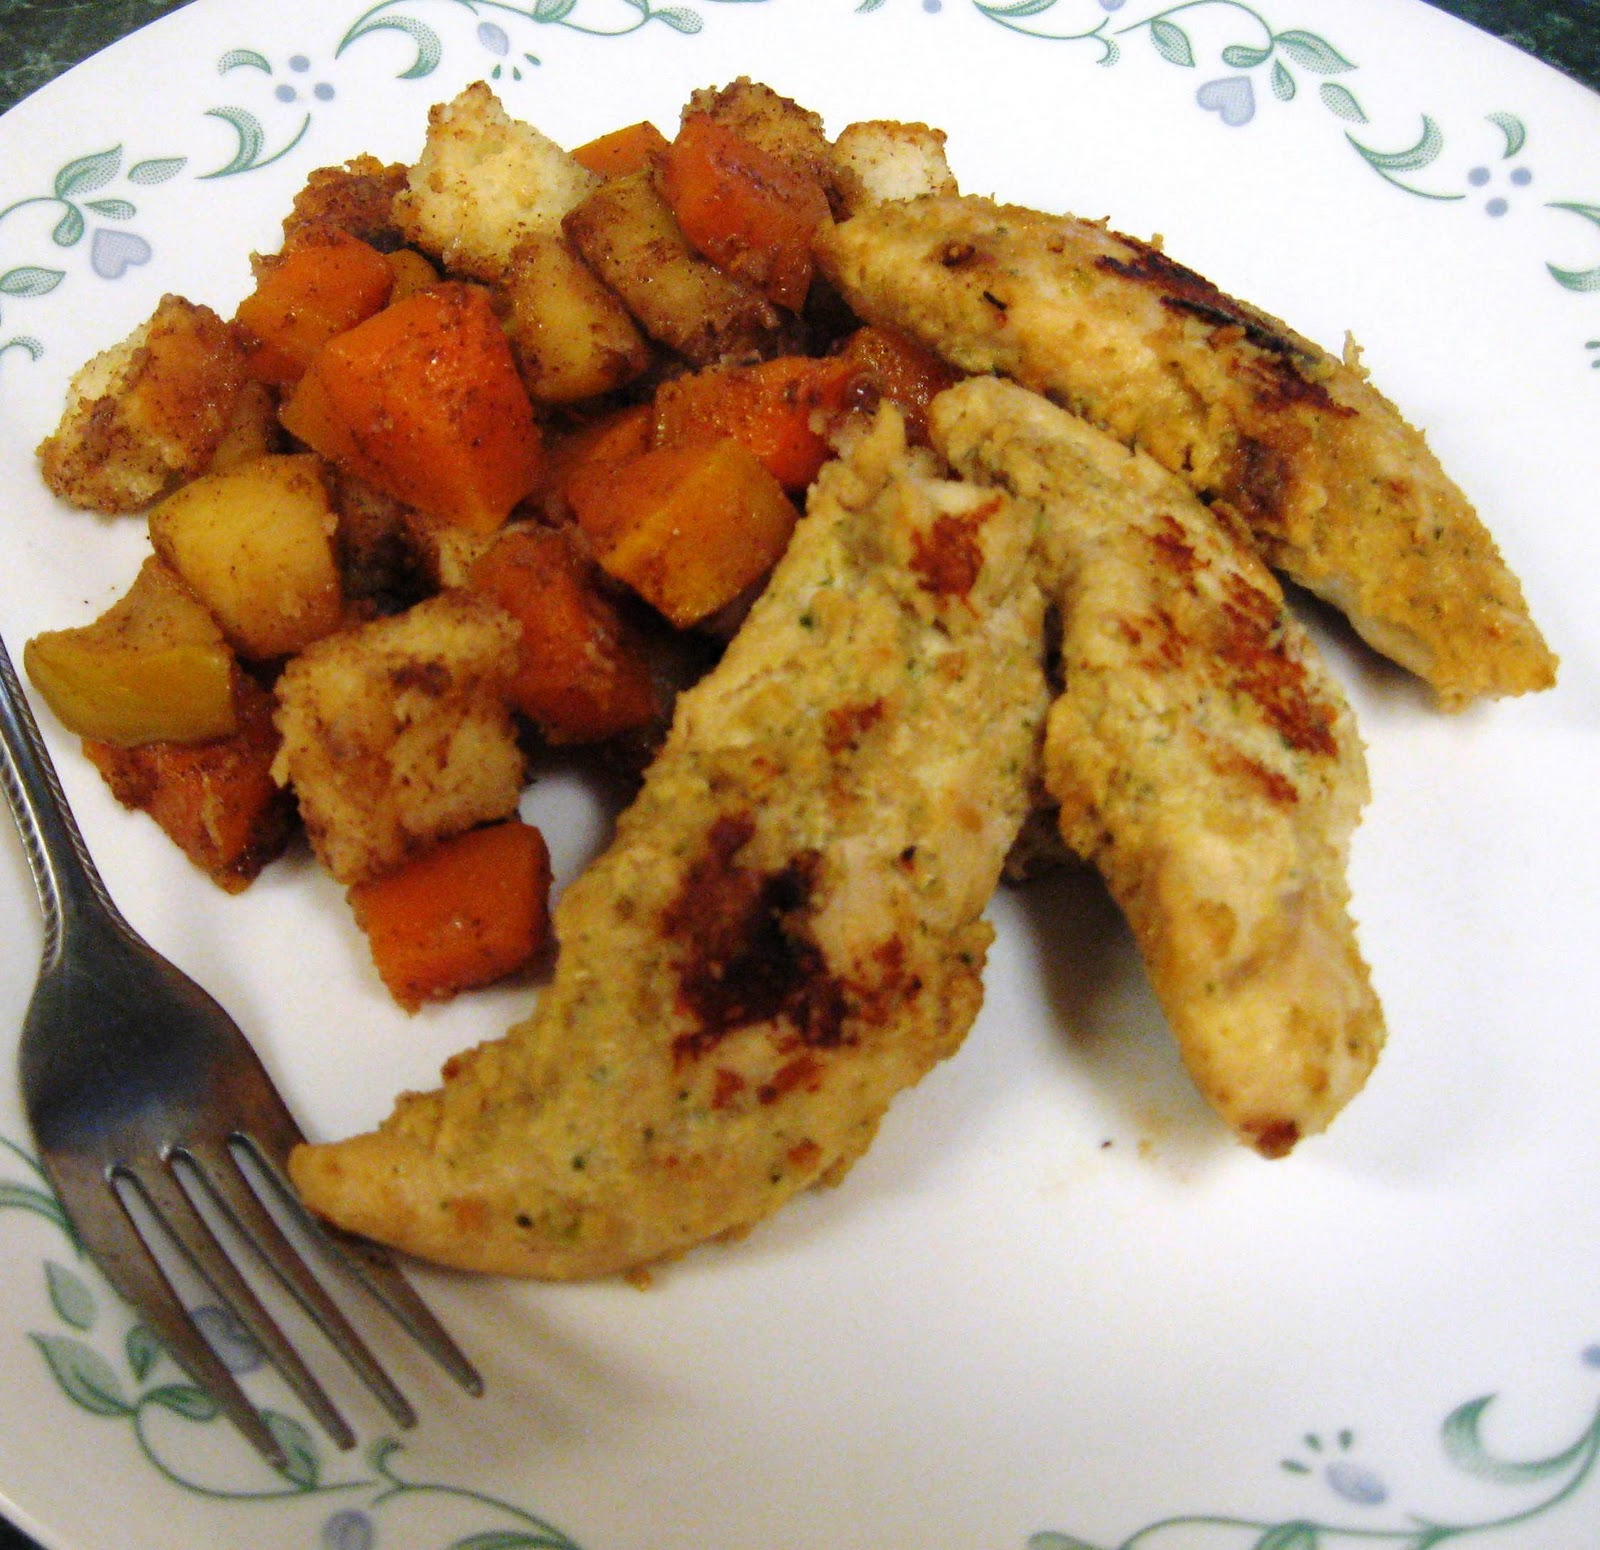 ... Does Dinner... Healthy & Low Calorie: Spicy Garlic Cashew Chicken